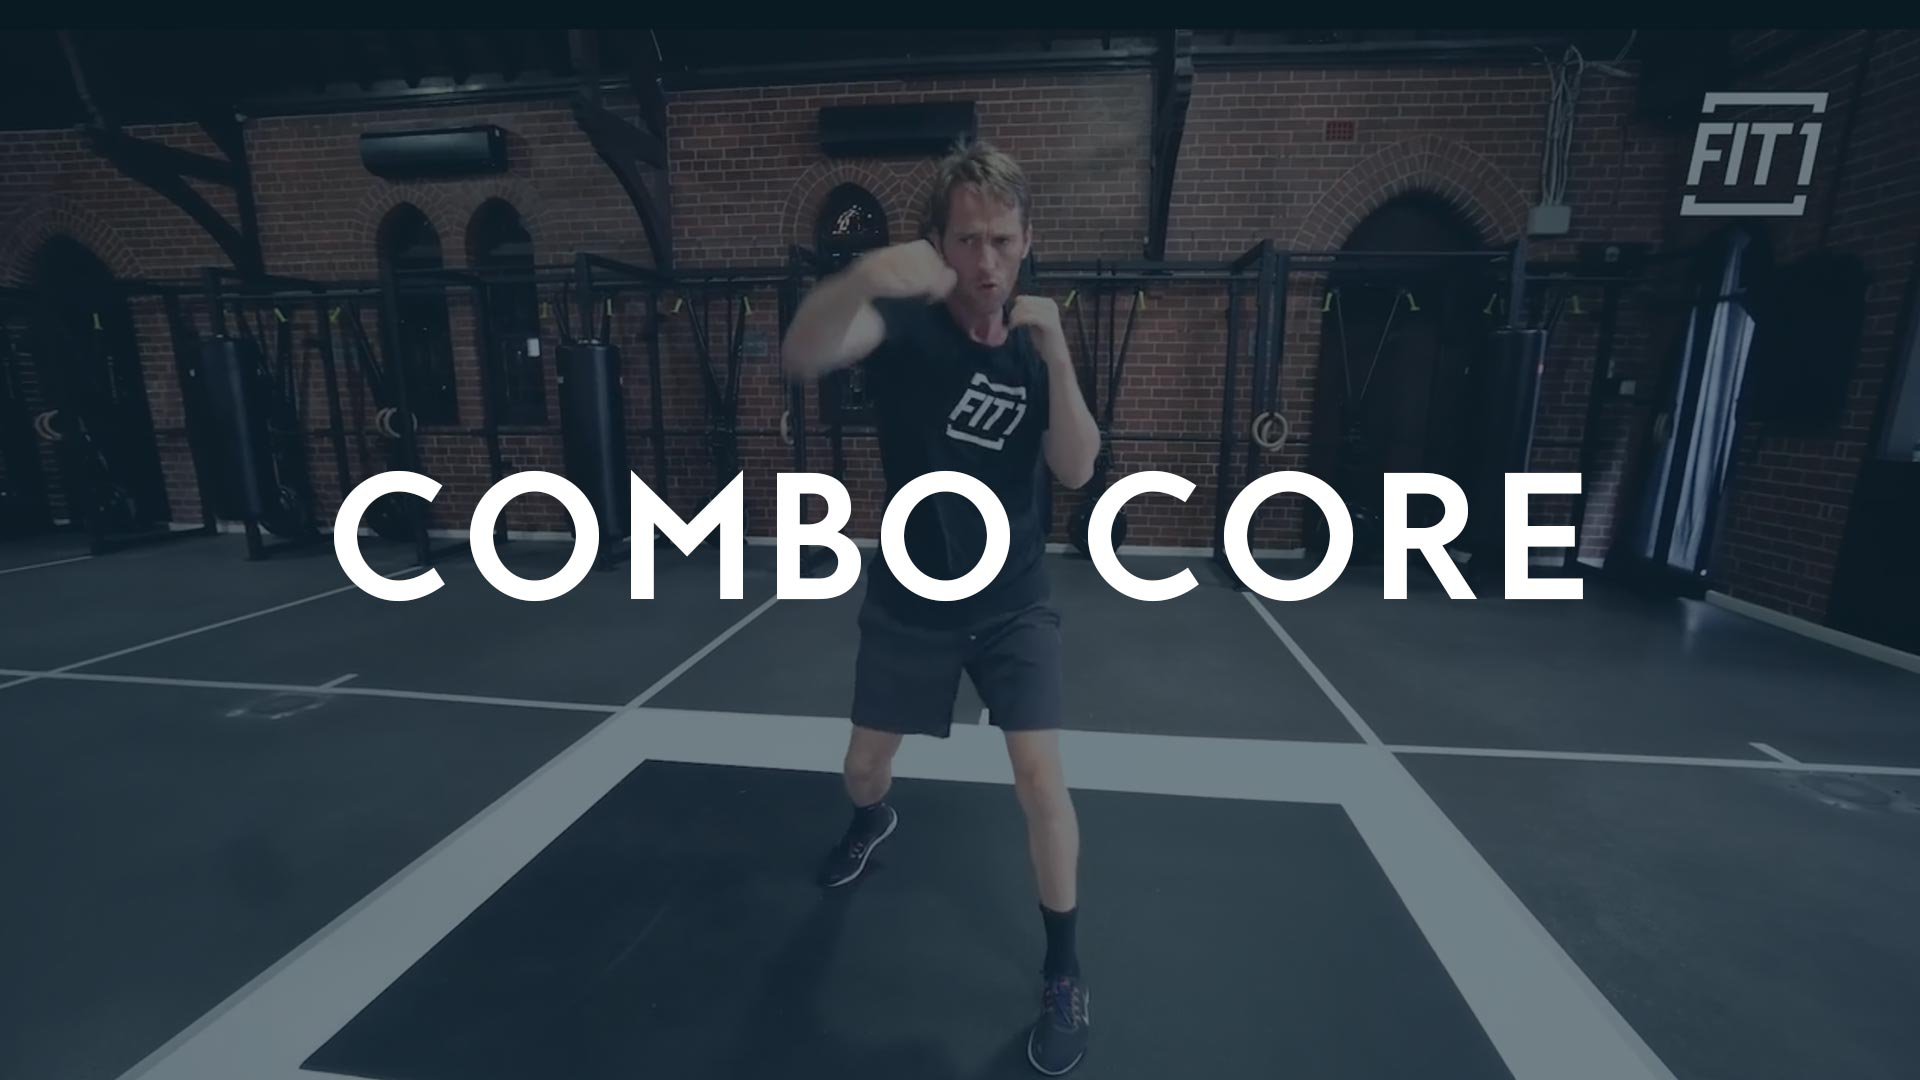 Combo Core